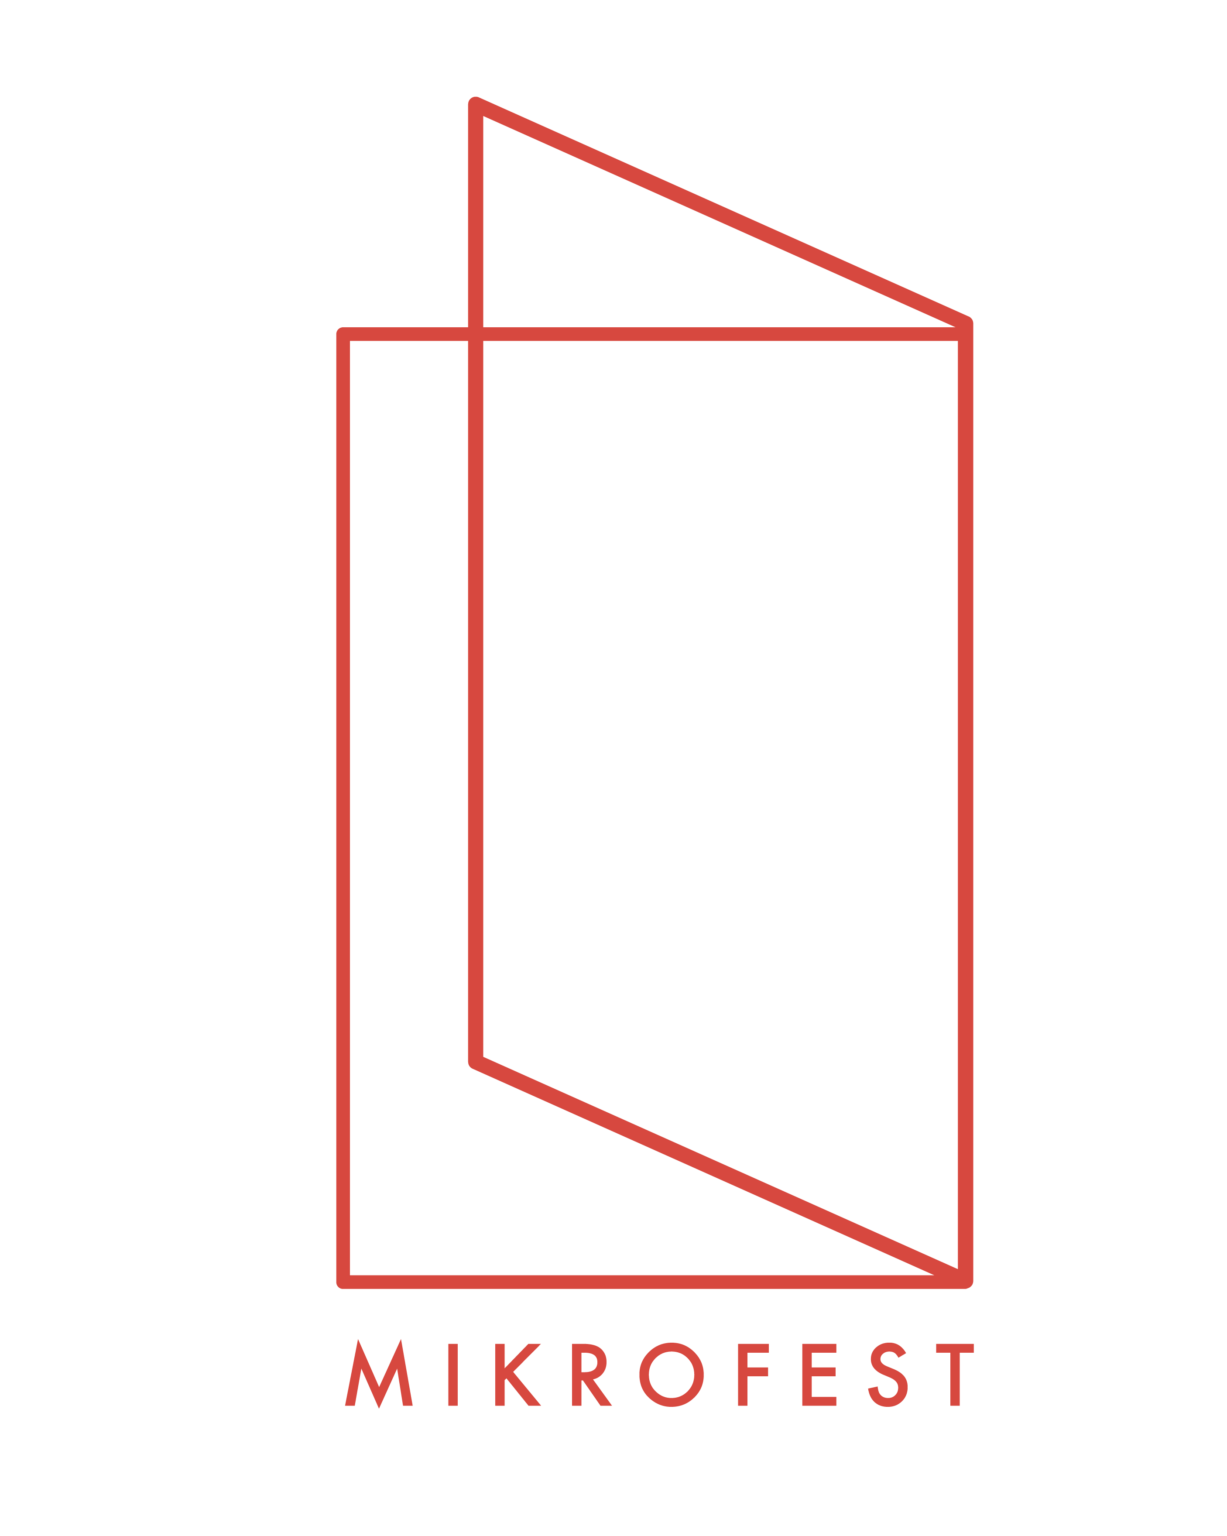 Peach » Mikrofest